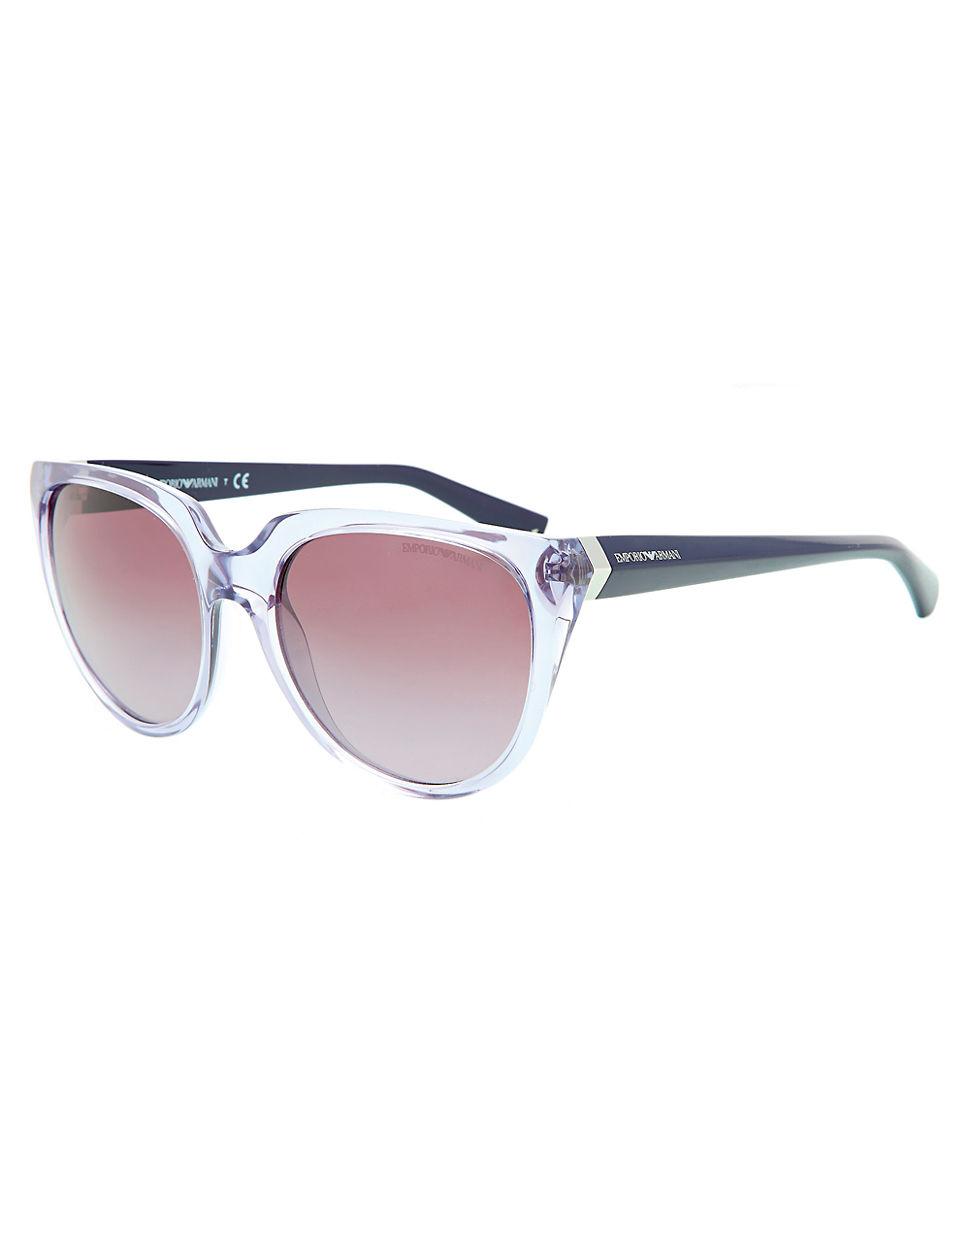 6536586d8fb1 Emporio Armani Essential Leisure Cat-Eye Sunglasses in Brown for Men ...